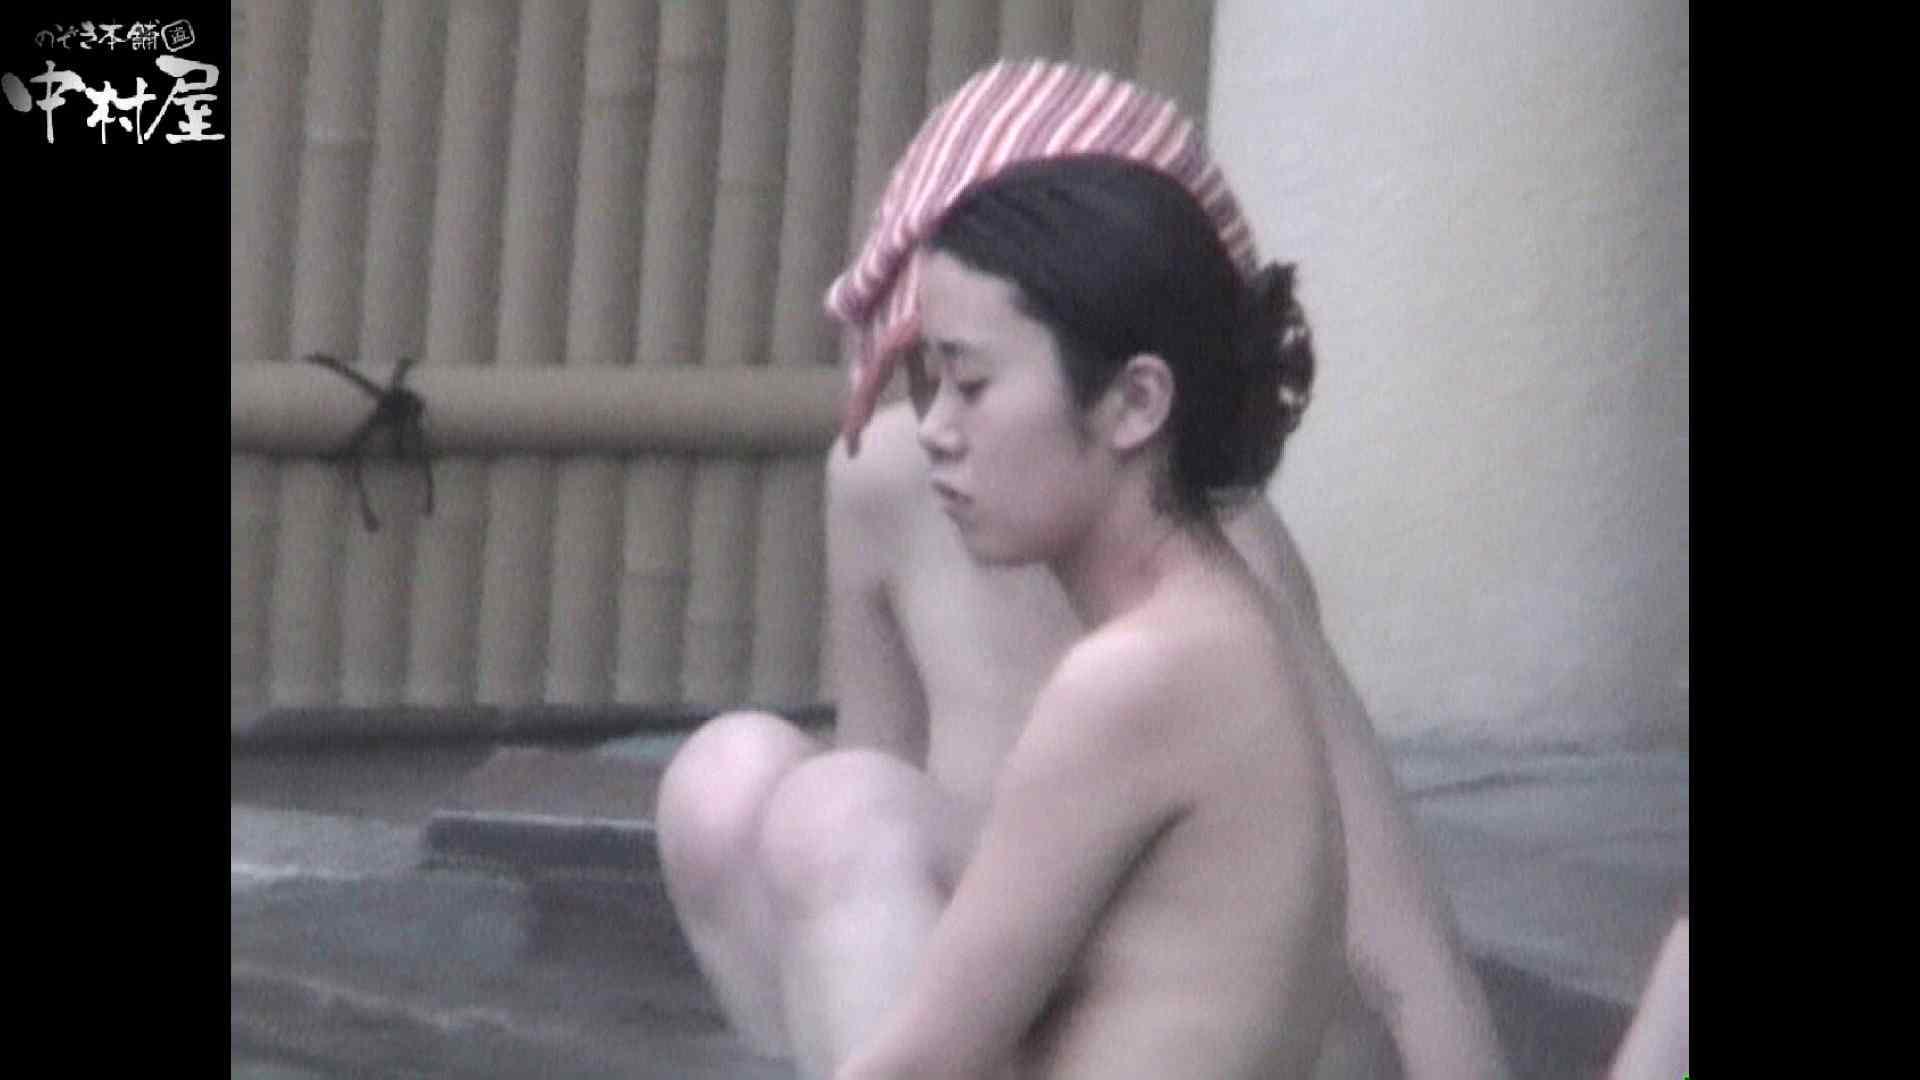 Aquaな露天風呂Vol.923 盗撮  84pic 26